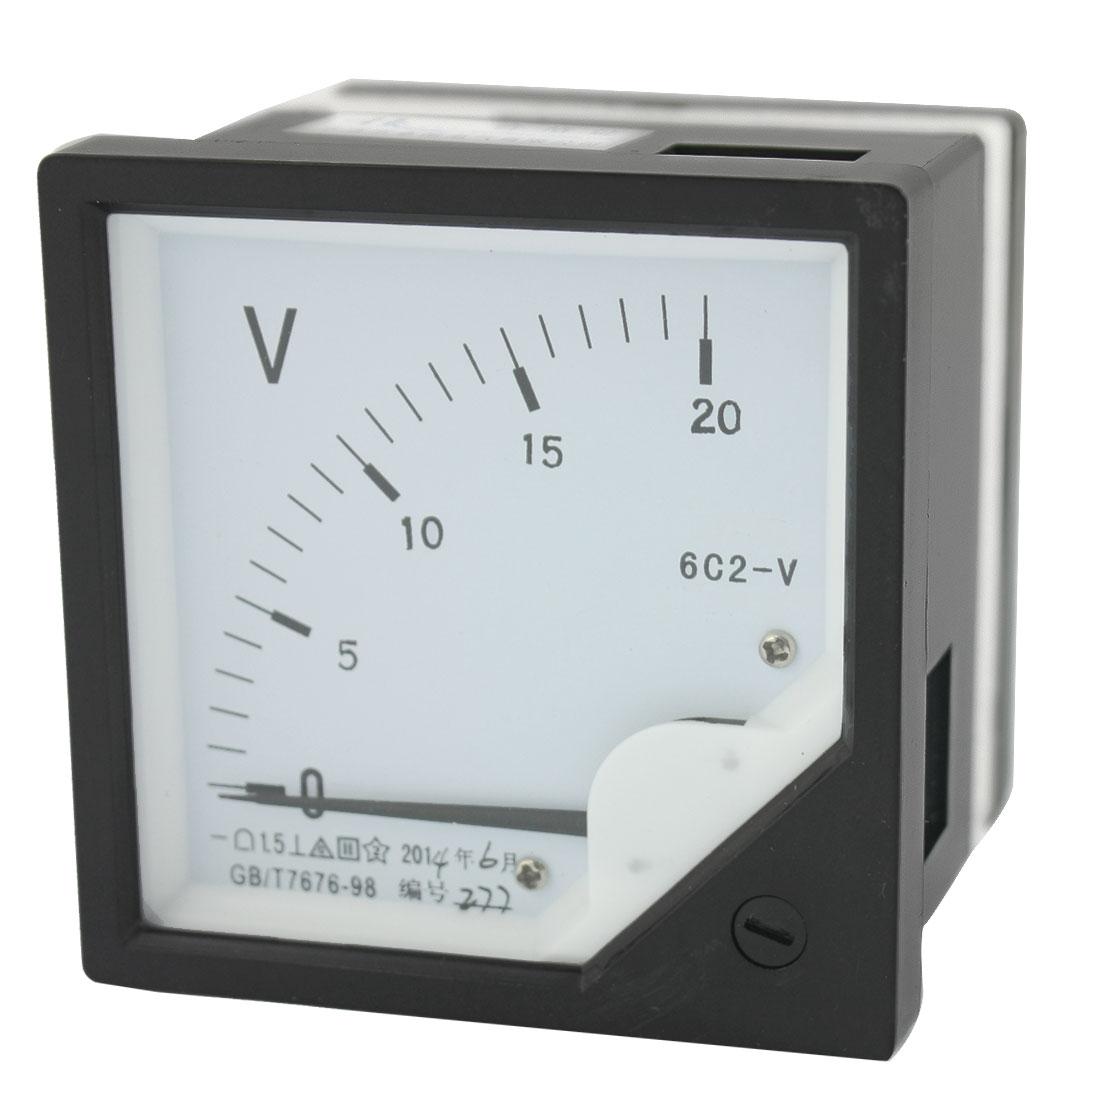 DC 0-20V Measure Range Class 1.5 Rectangle Plastic Panel Analog Voltmeter Voltage Meter